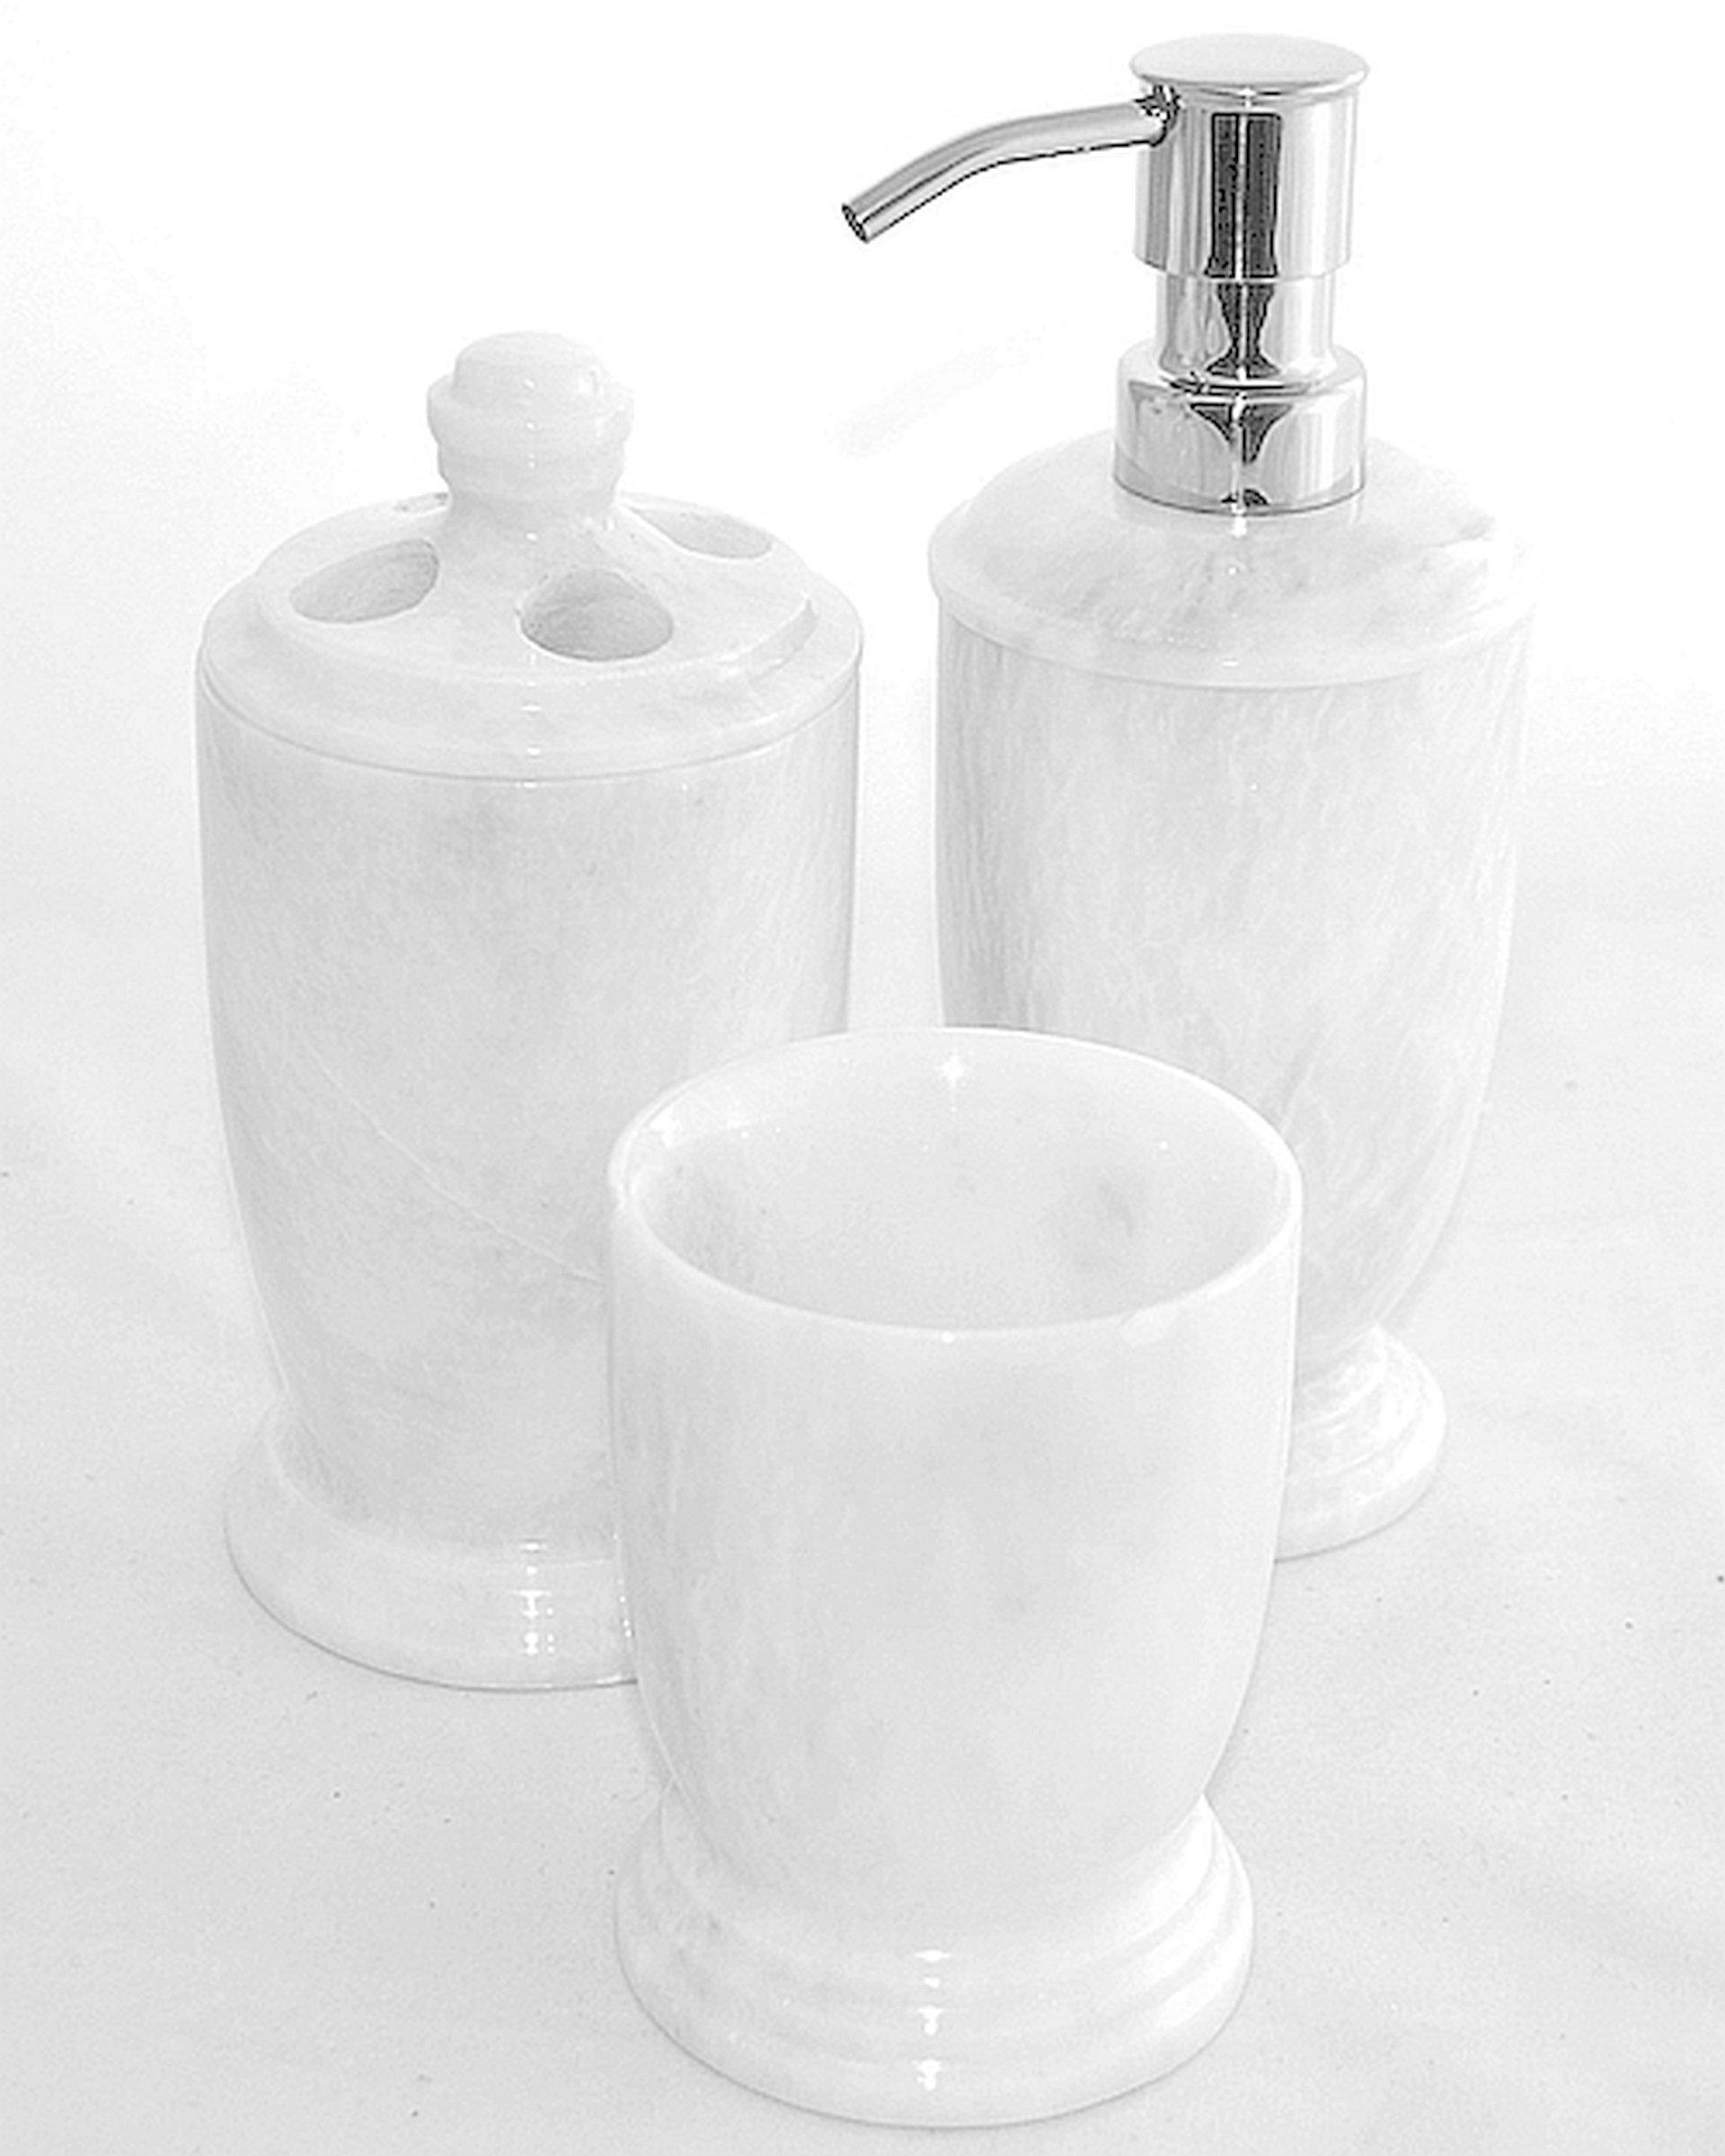 Nature Home Decor 300WZ3 White Marble 3-Piece Bathroom Accessory Set